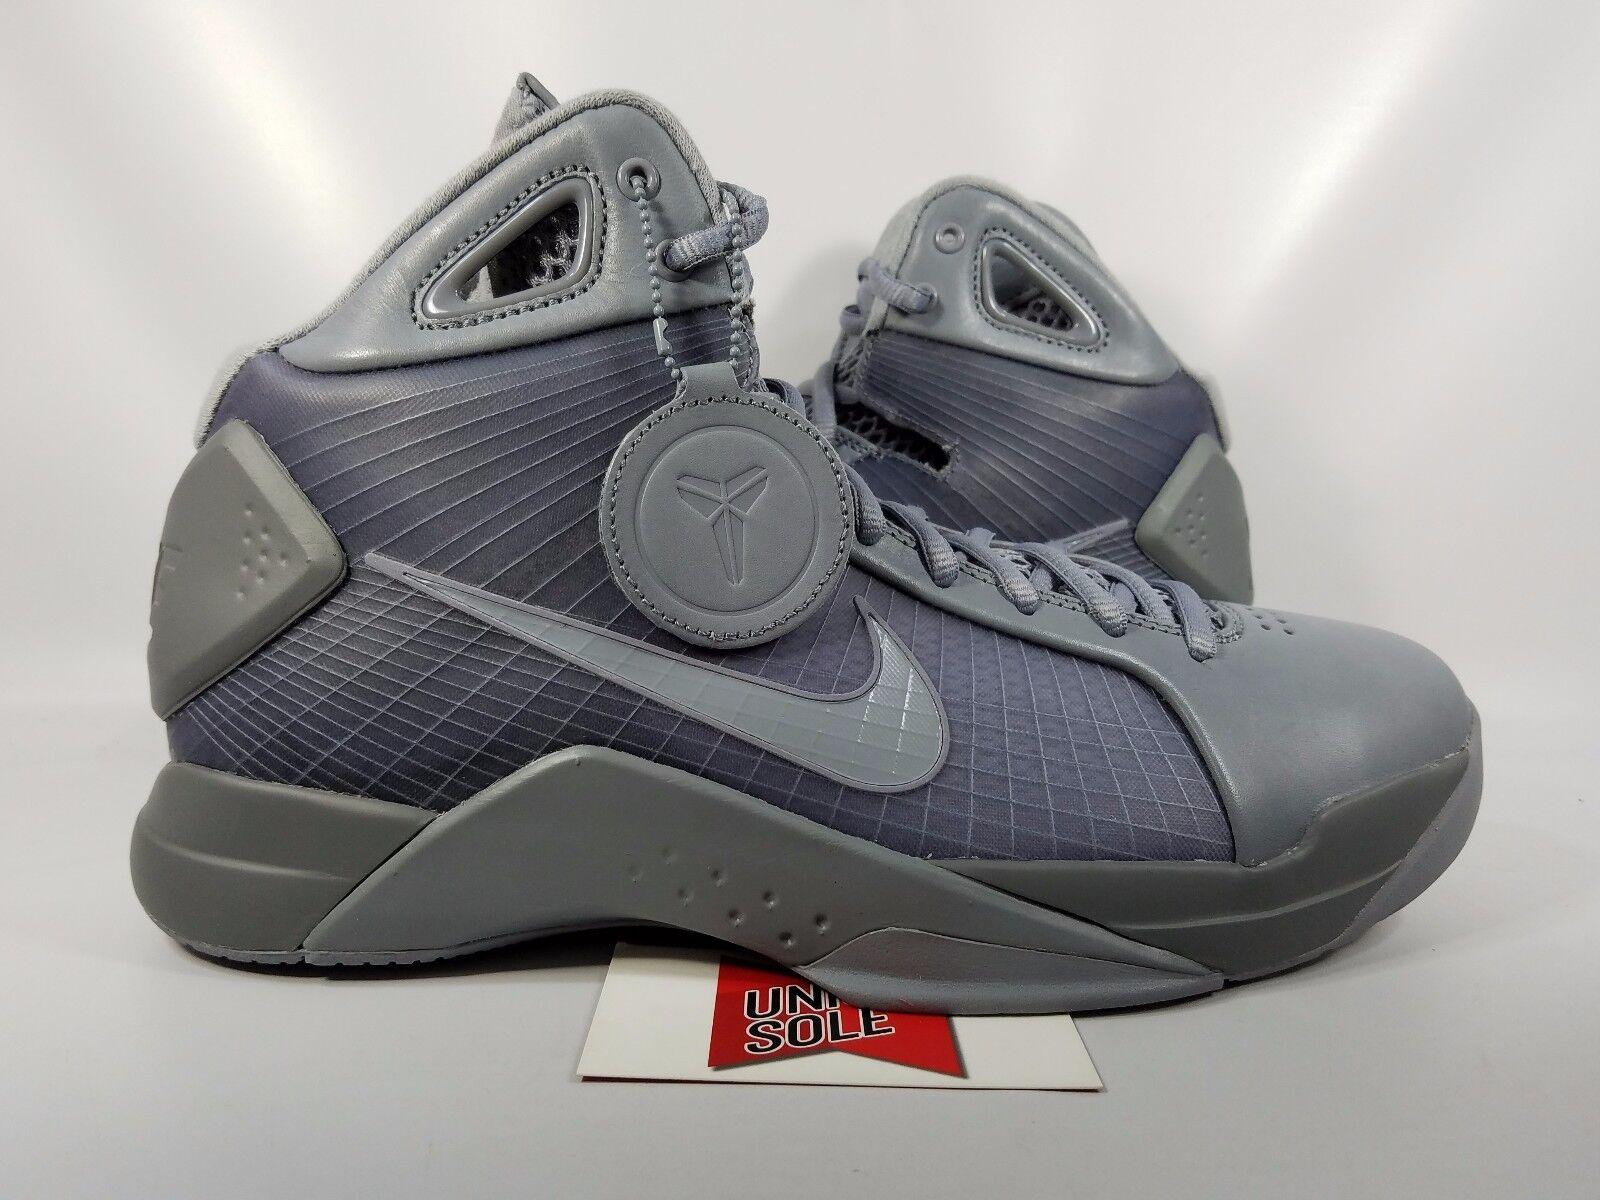 Nike Hyperdunk FTB '08 FTB Hyperdunk FADE TO BLACK PACK MAMBA STEALTH GREY 869611-001 sz 10 cc6c87